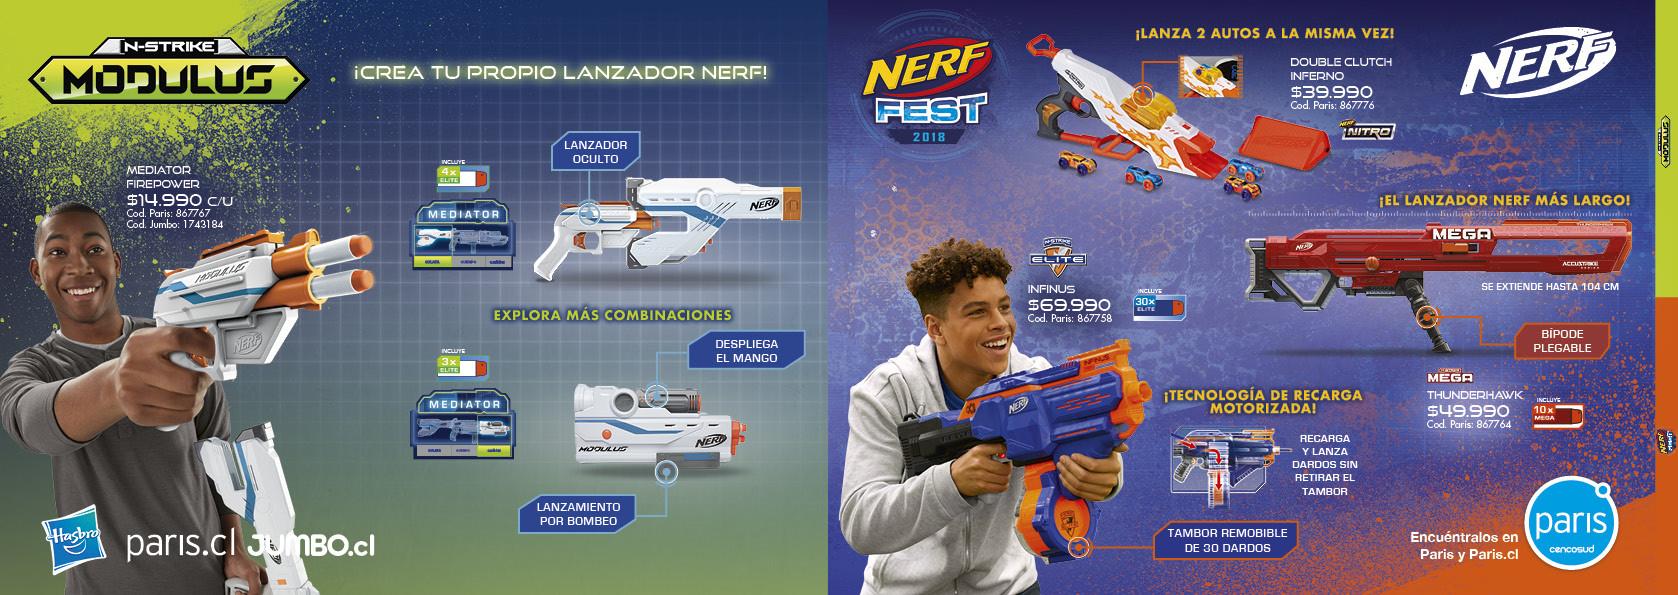 Nerf Cencosud4.jpg